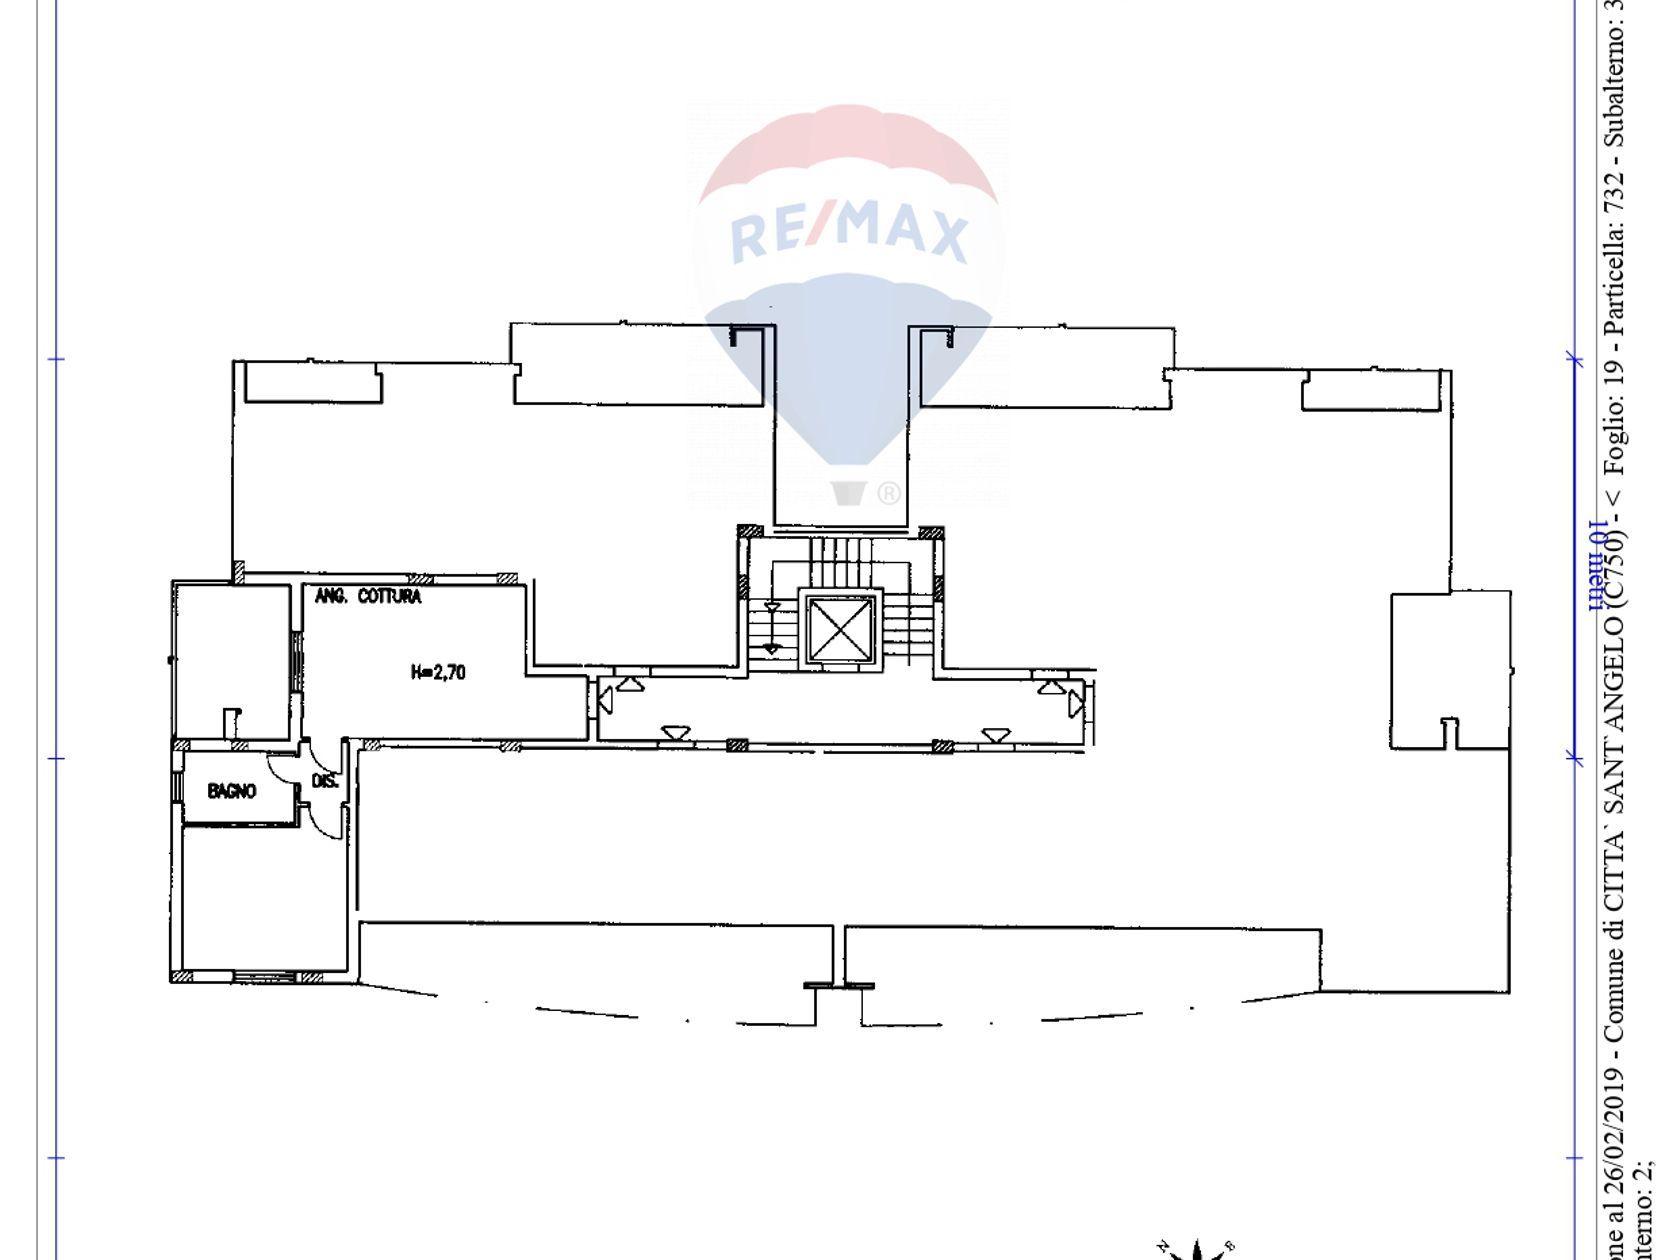 Appartamento Marina, Città Sant'Angelo, PE Vendita - Planimetria 1